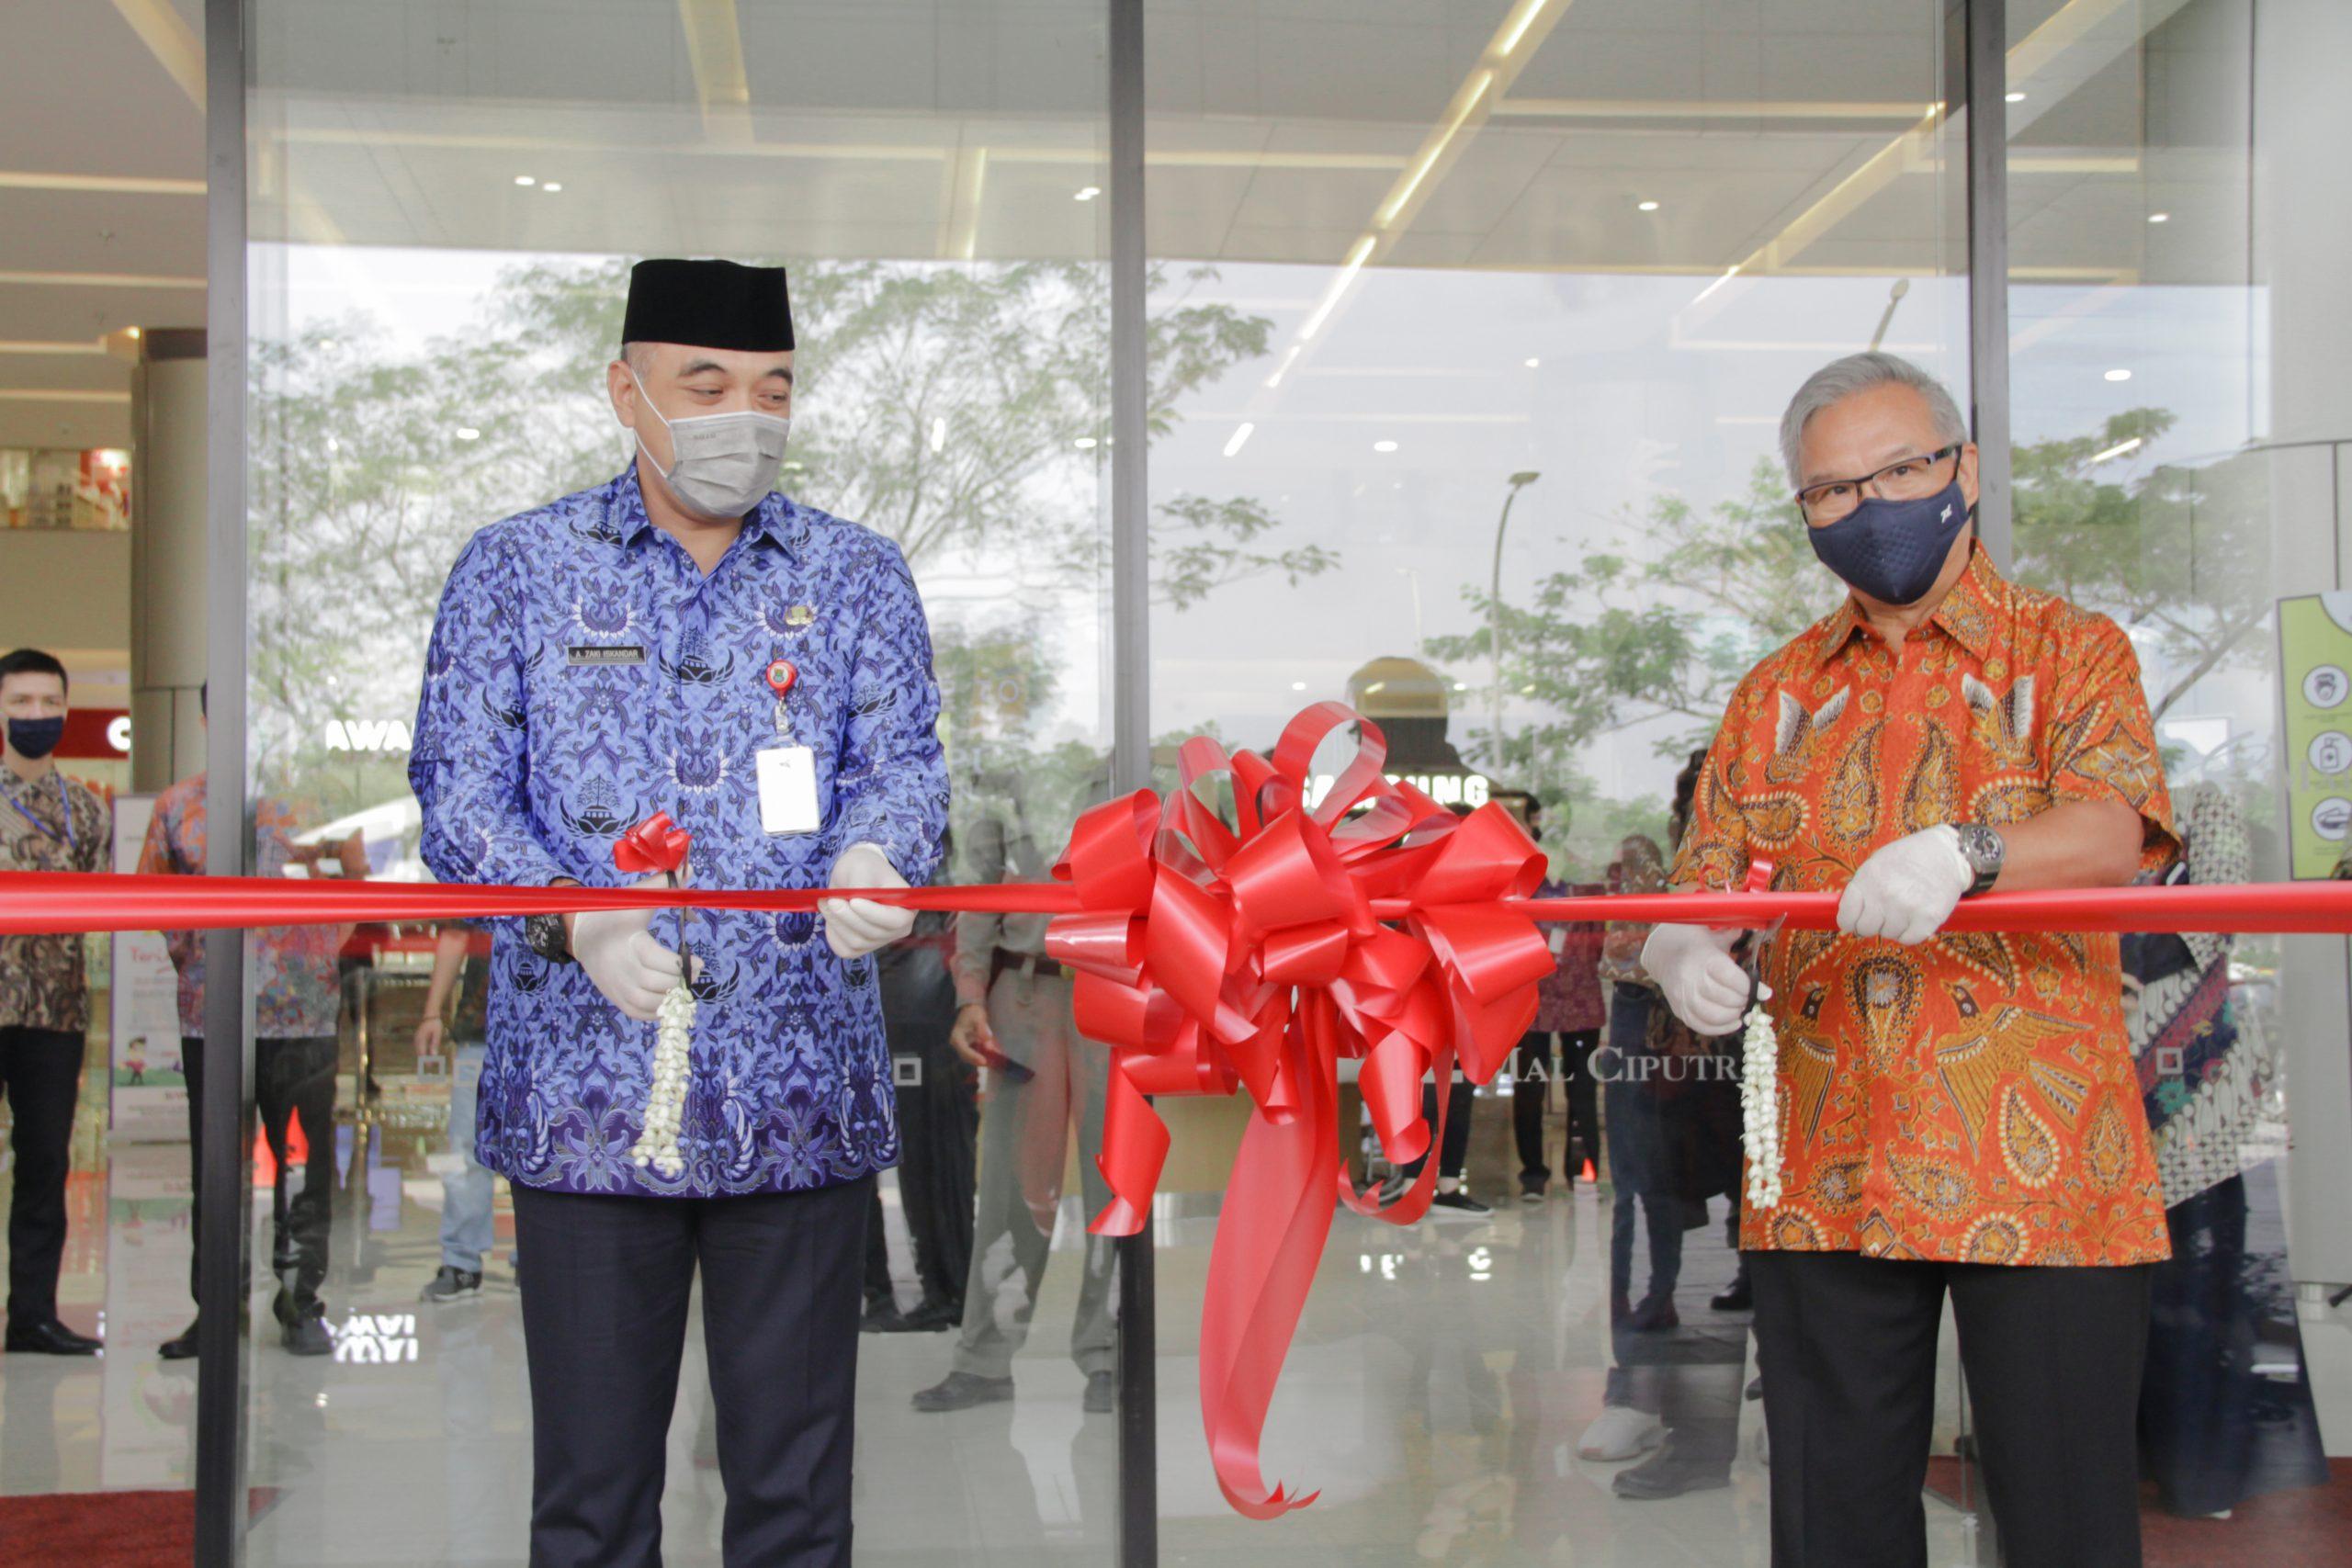 Mal Ciputra CitraRaya Tangerang Resmi Beroperasi